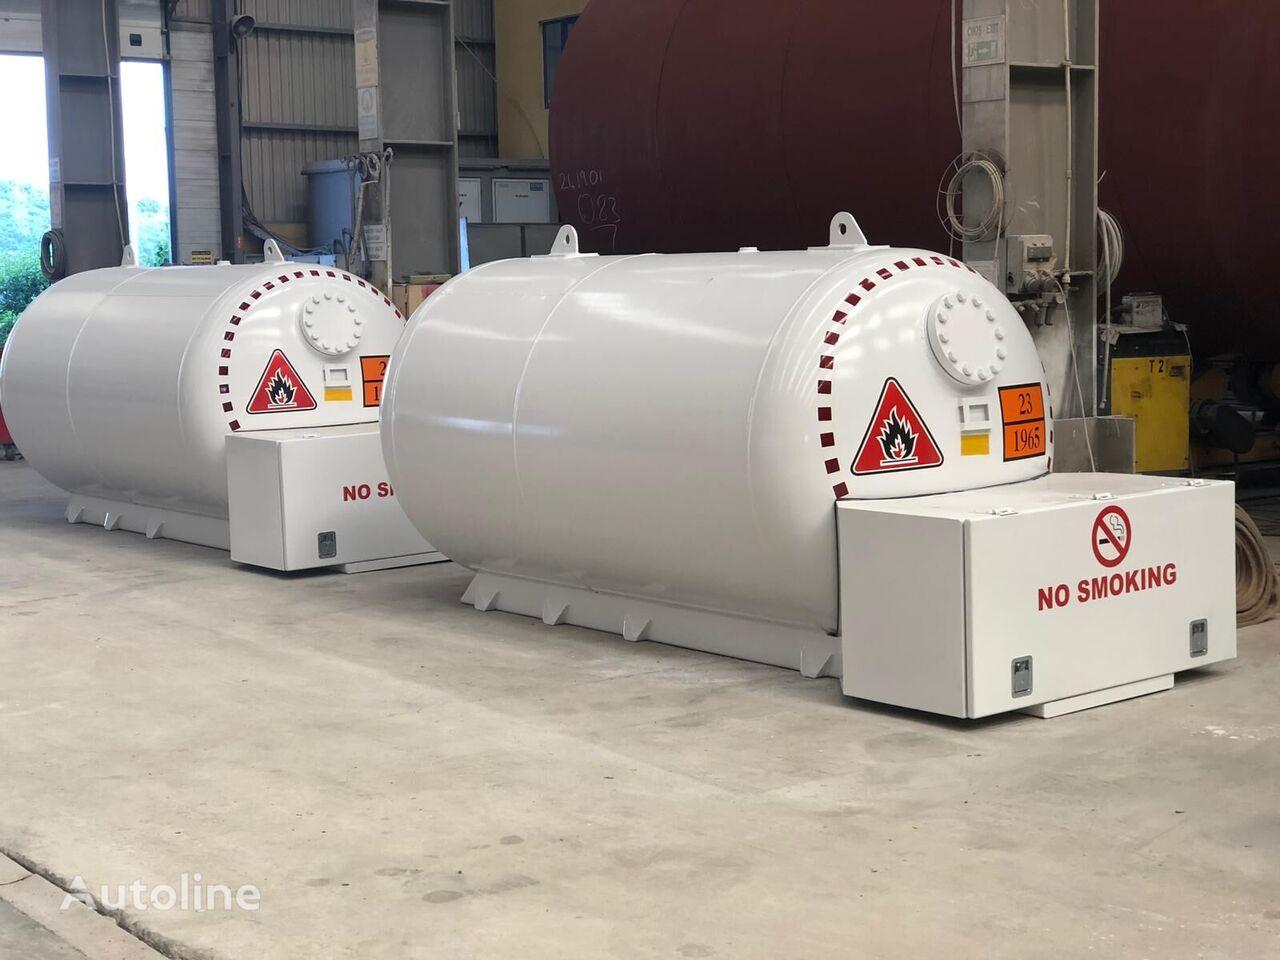 nova cisterna za plin Micansan bobtaıl tank 4-8-10 m3 for domestıc usıng